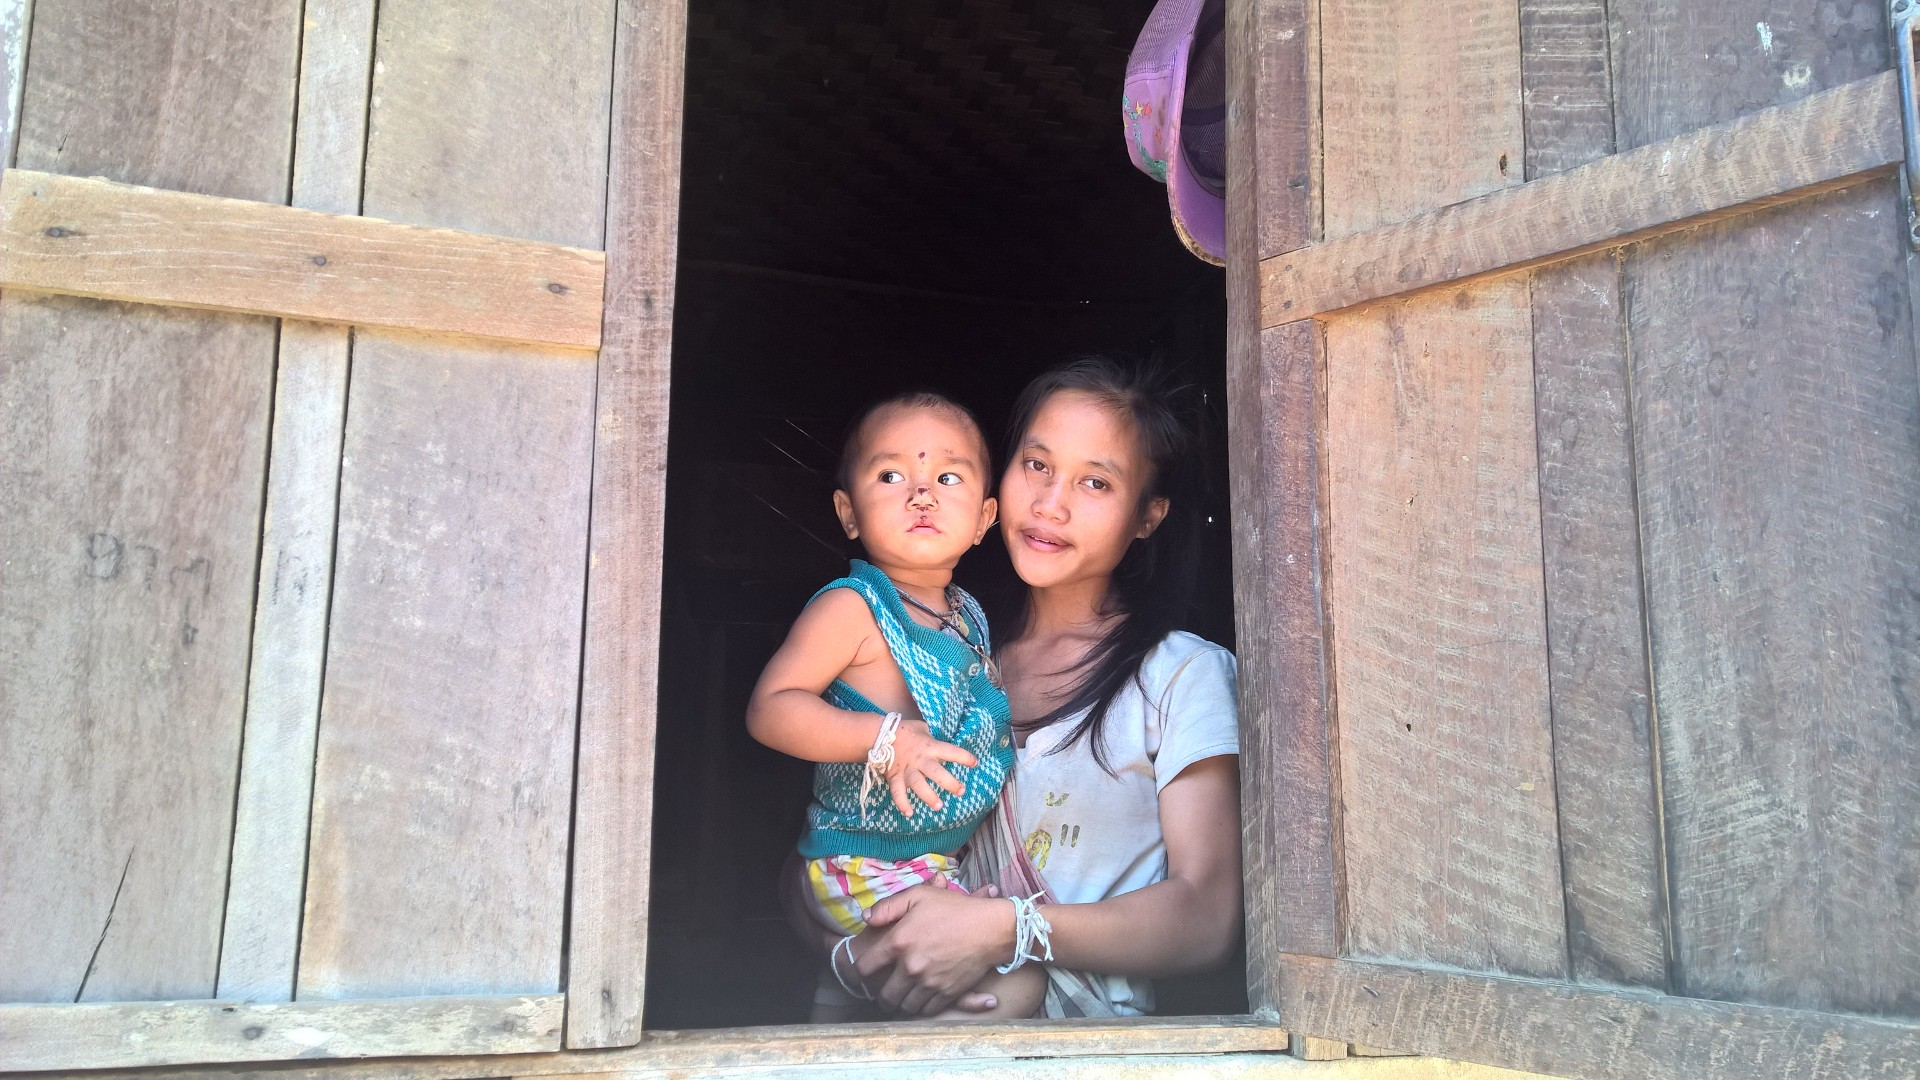 Etappe 1 der großen Mekongtour – der Norden